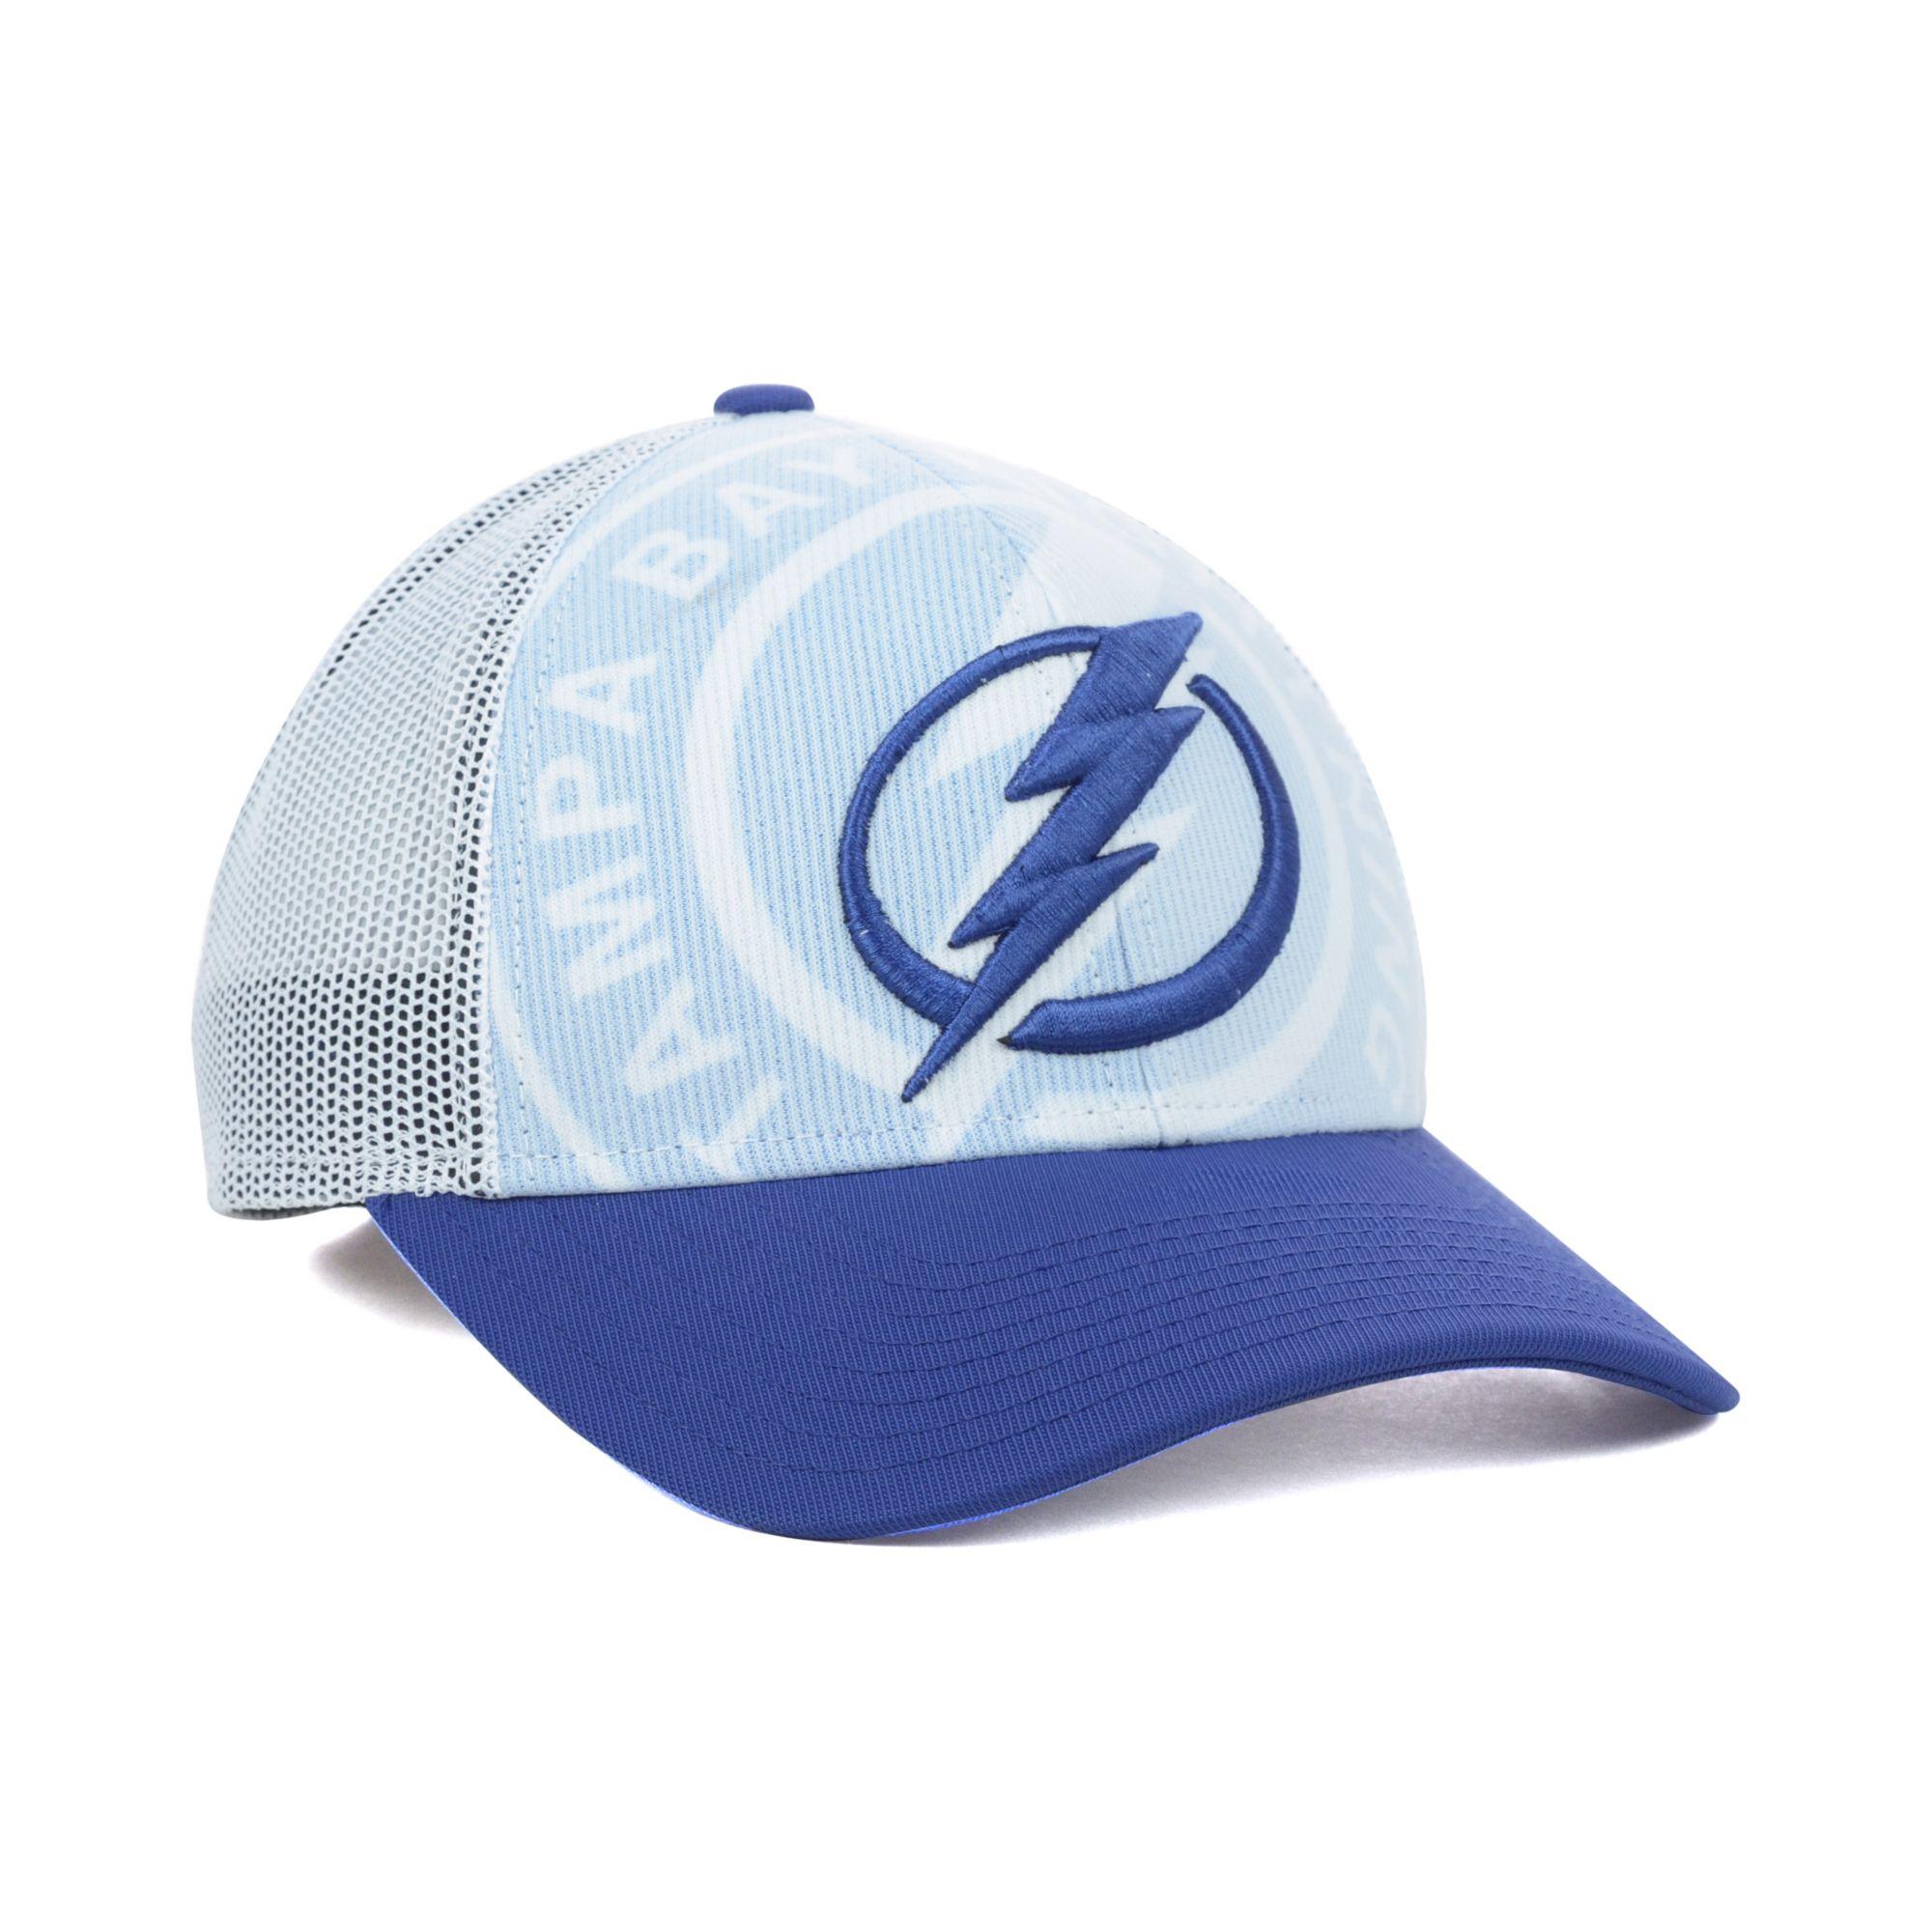 Lyst - Reebok Tampa Bay Lightning Nhl Draft Cap in Blue for Men 1e2f832d531c